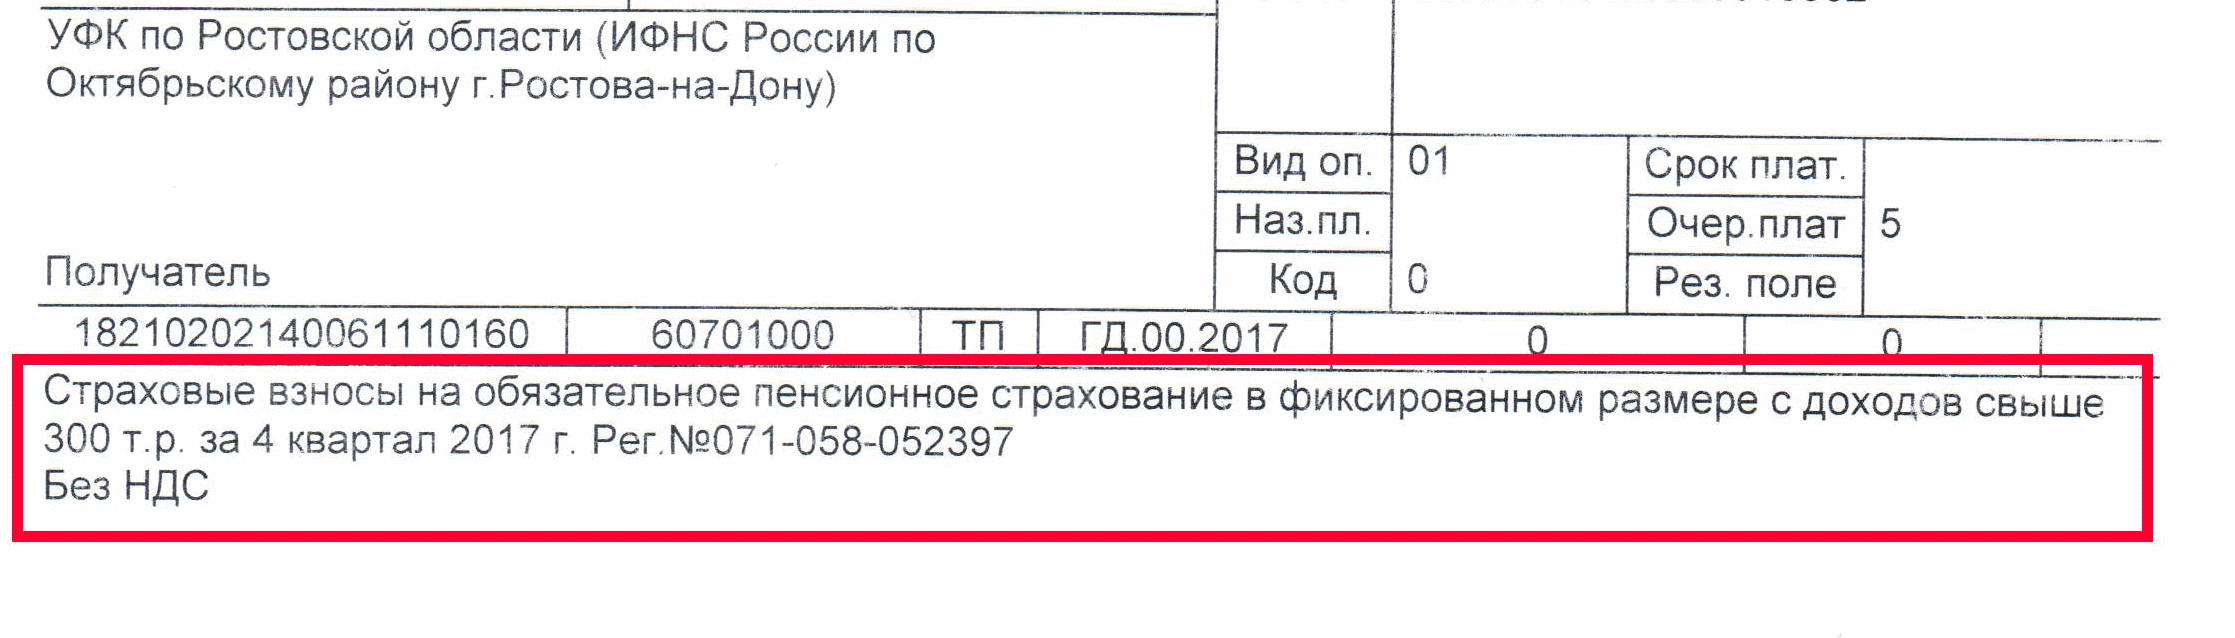 Назначение платежа образец